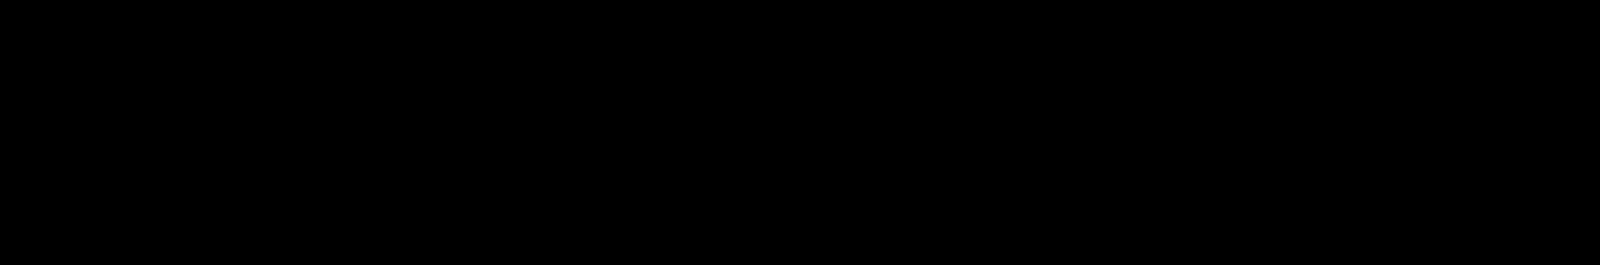 Math hl type 1 shadows